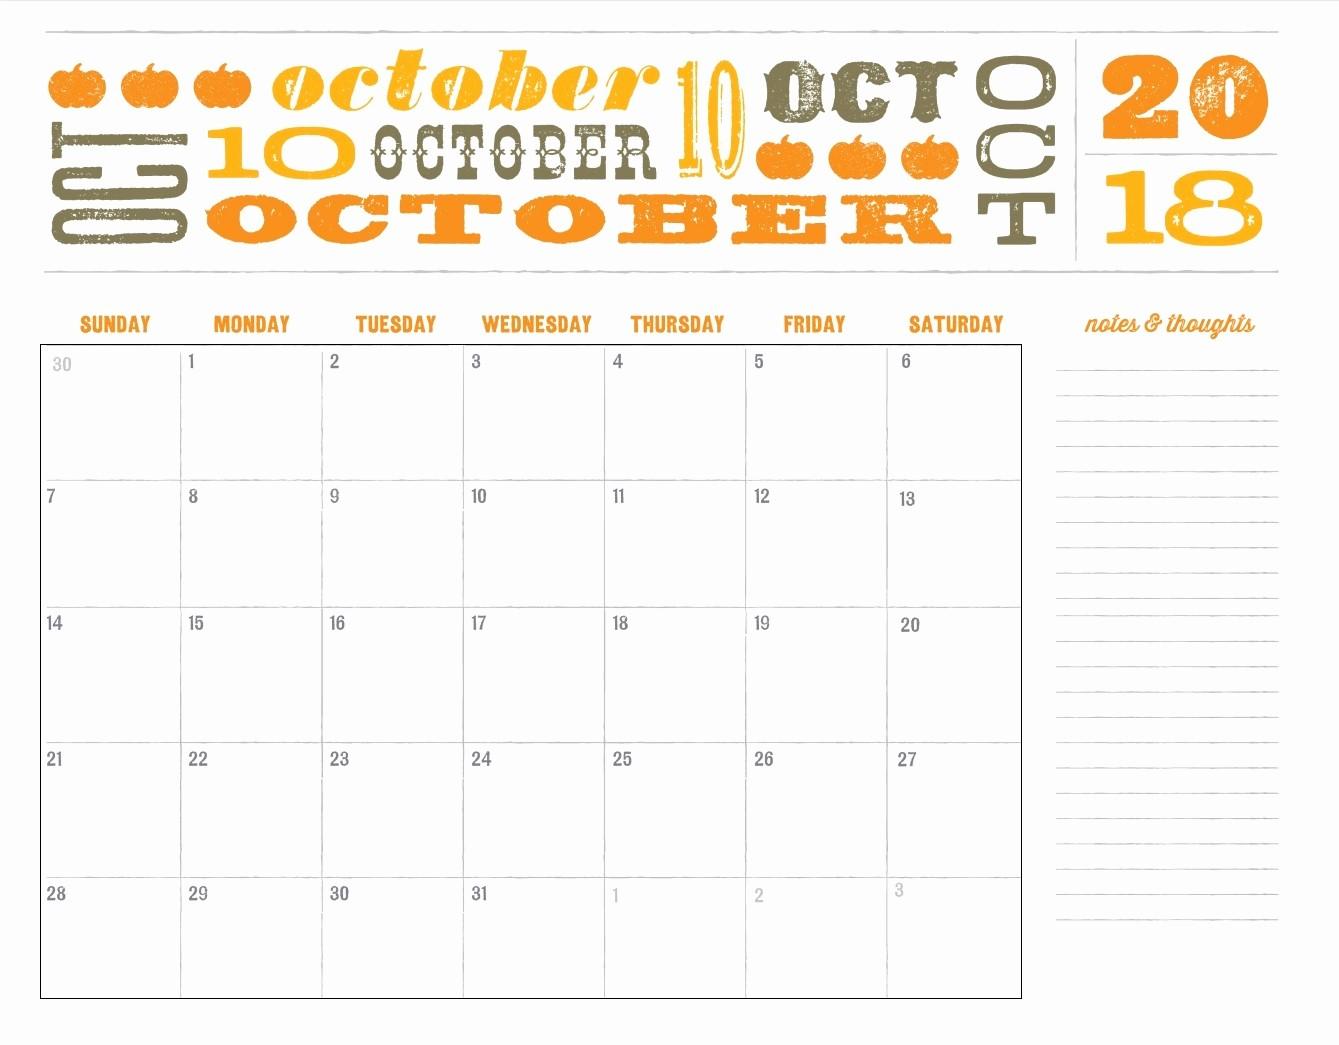 2018 Month by Month Calendar Lovely Twelve 12 Months 2018 Calendar